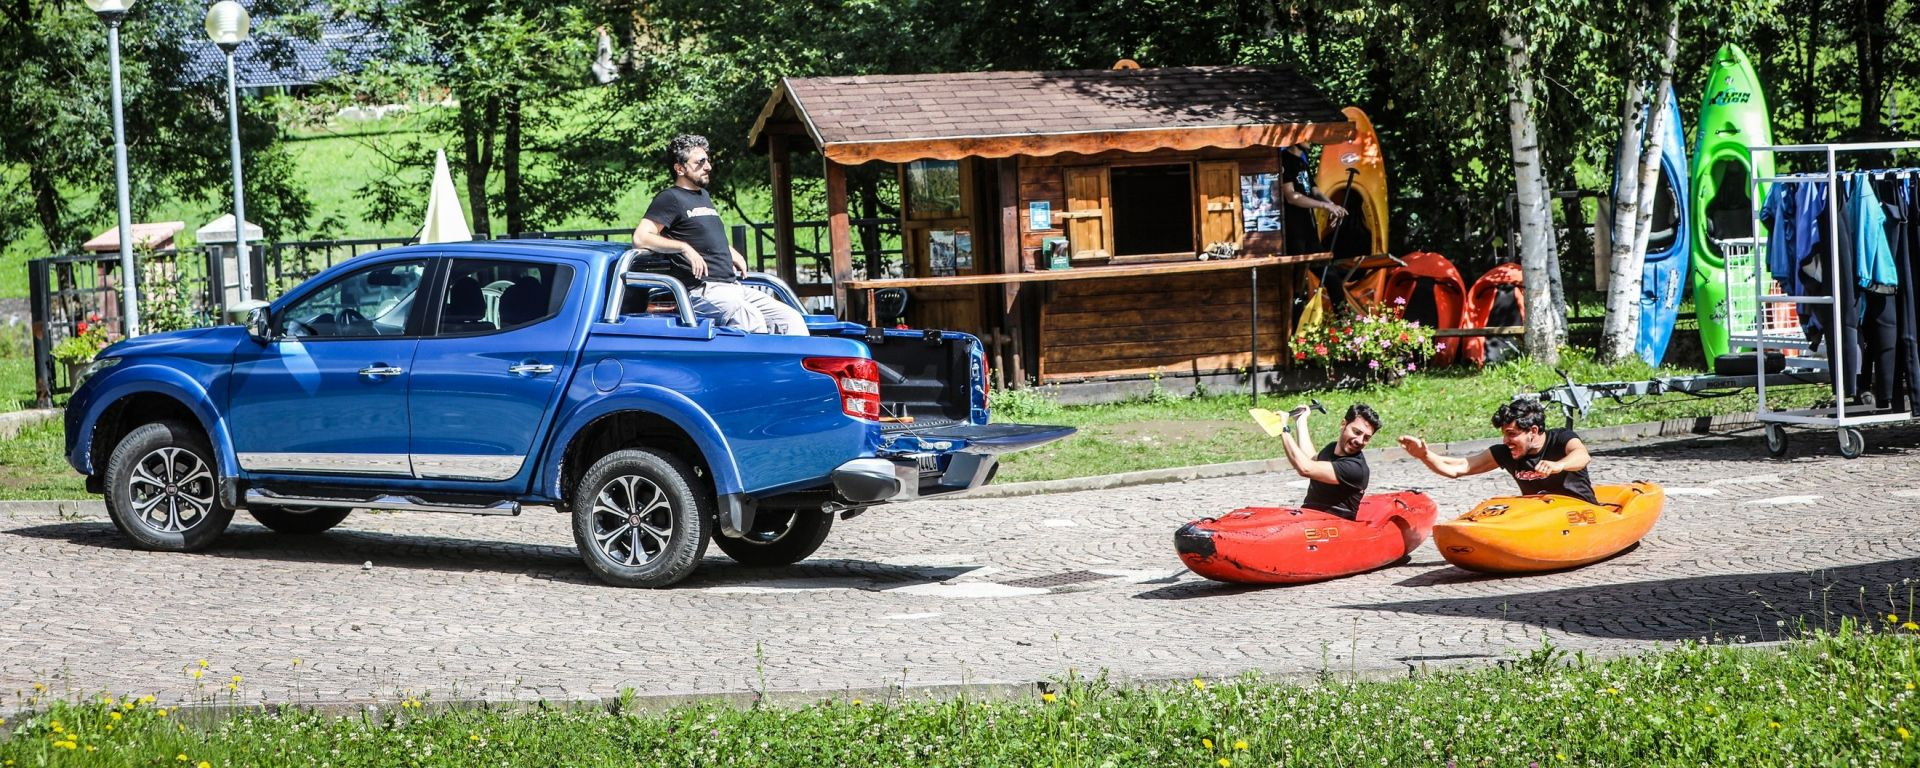 Fiat Fullback: storie di rafting e offroad fra i bricchi